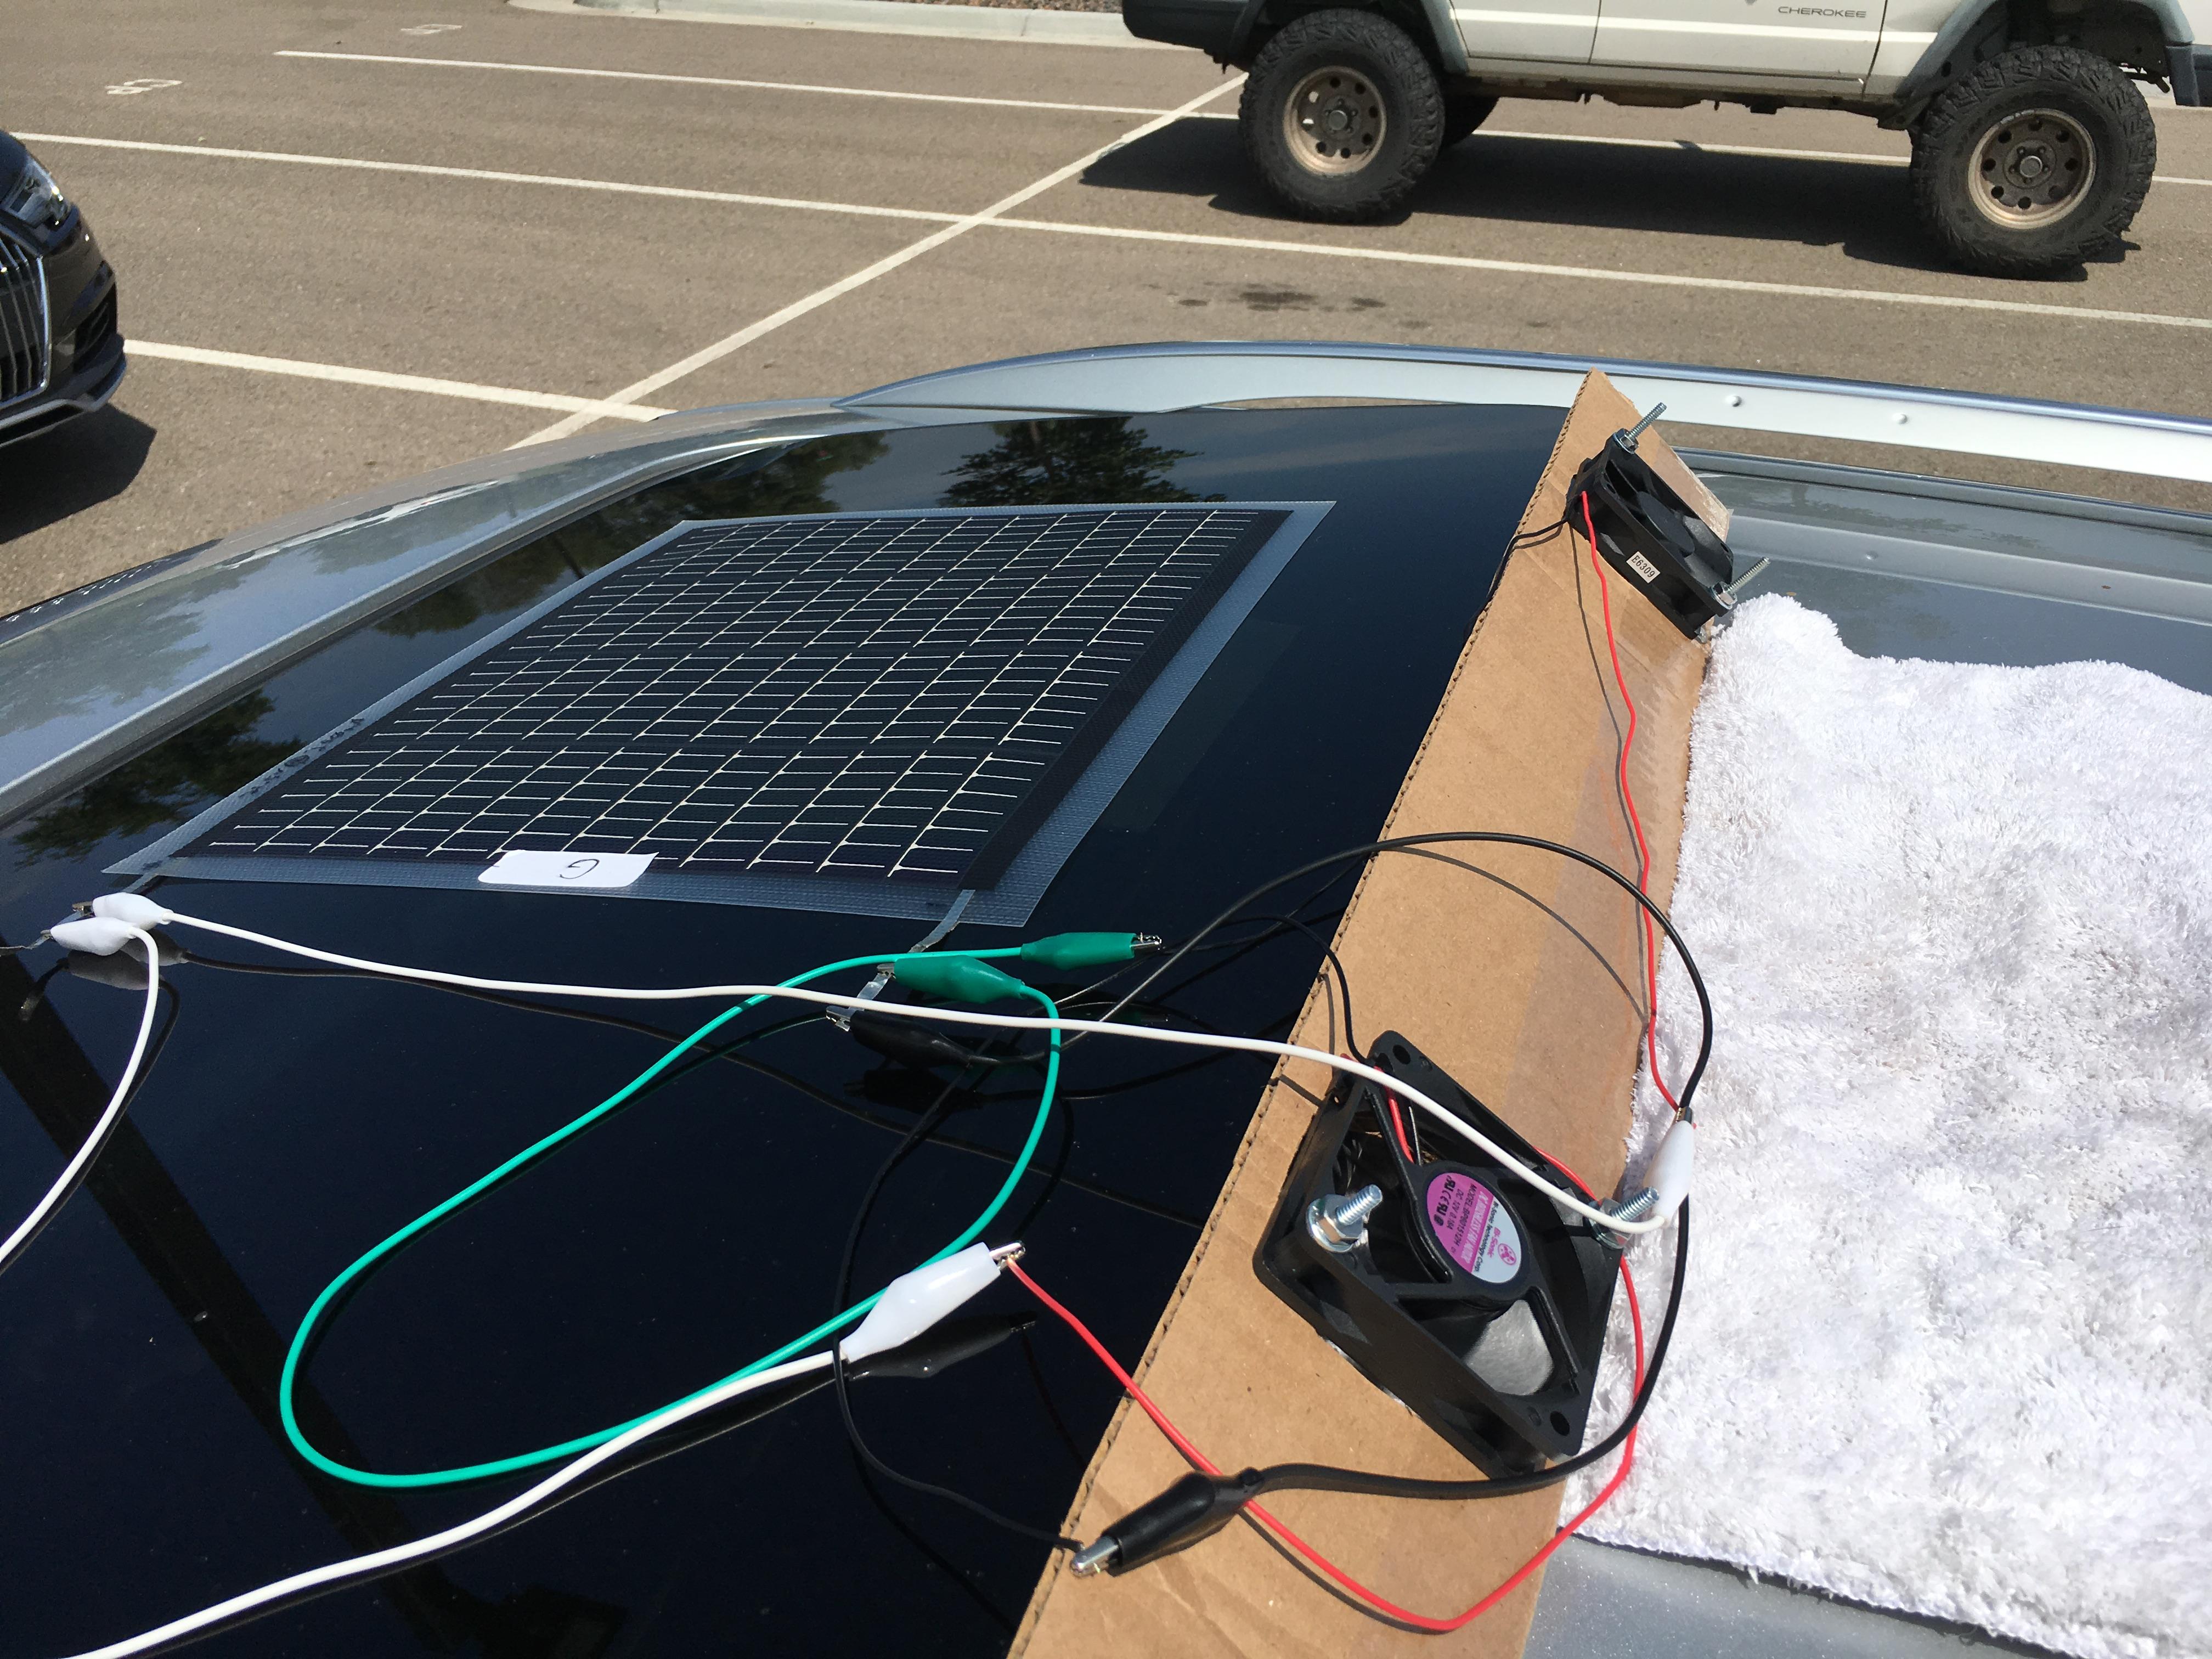 Enginursday: Solar Fans - News - SparkFun Electronics